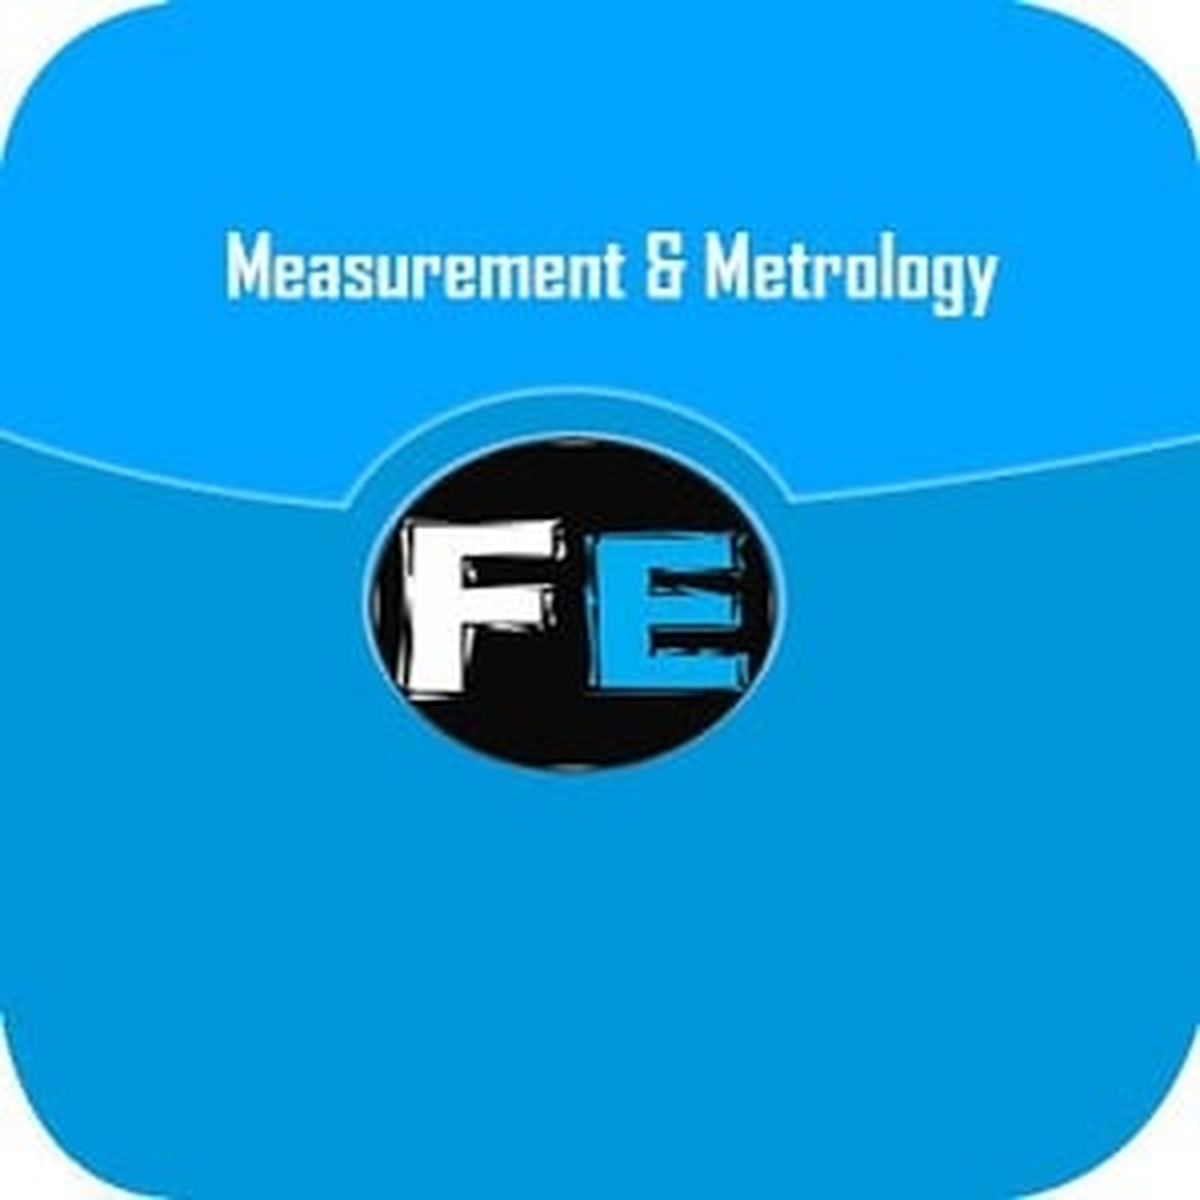 Measurement & Metrology-1